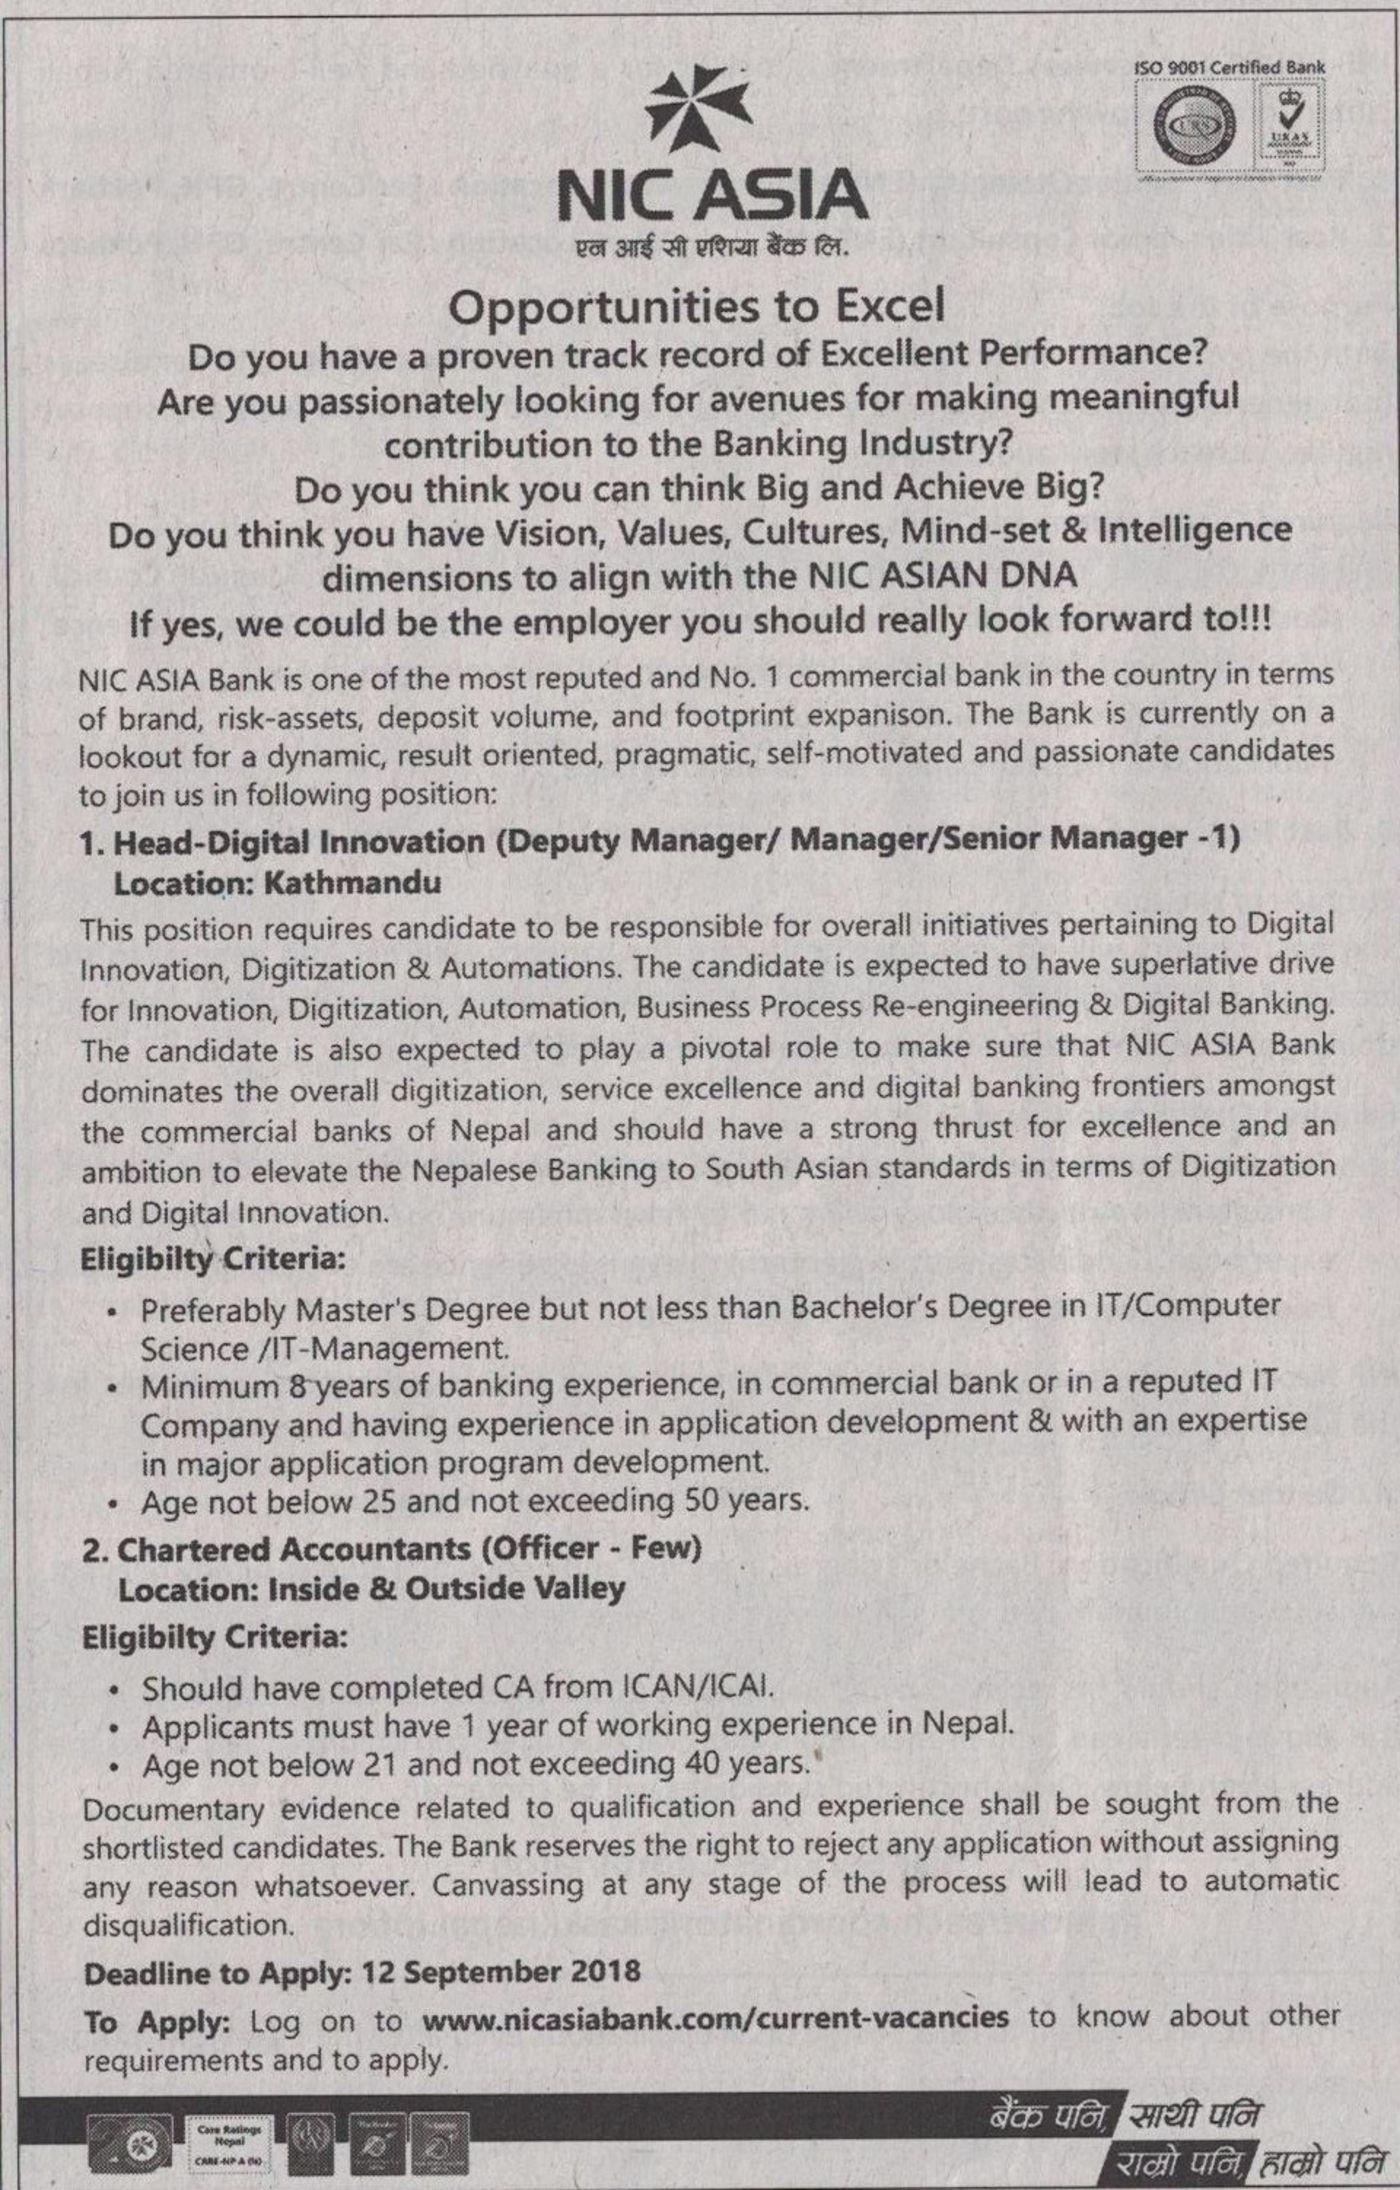 Deputy manager job description in bank